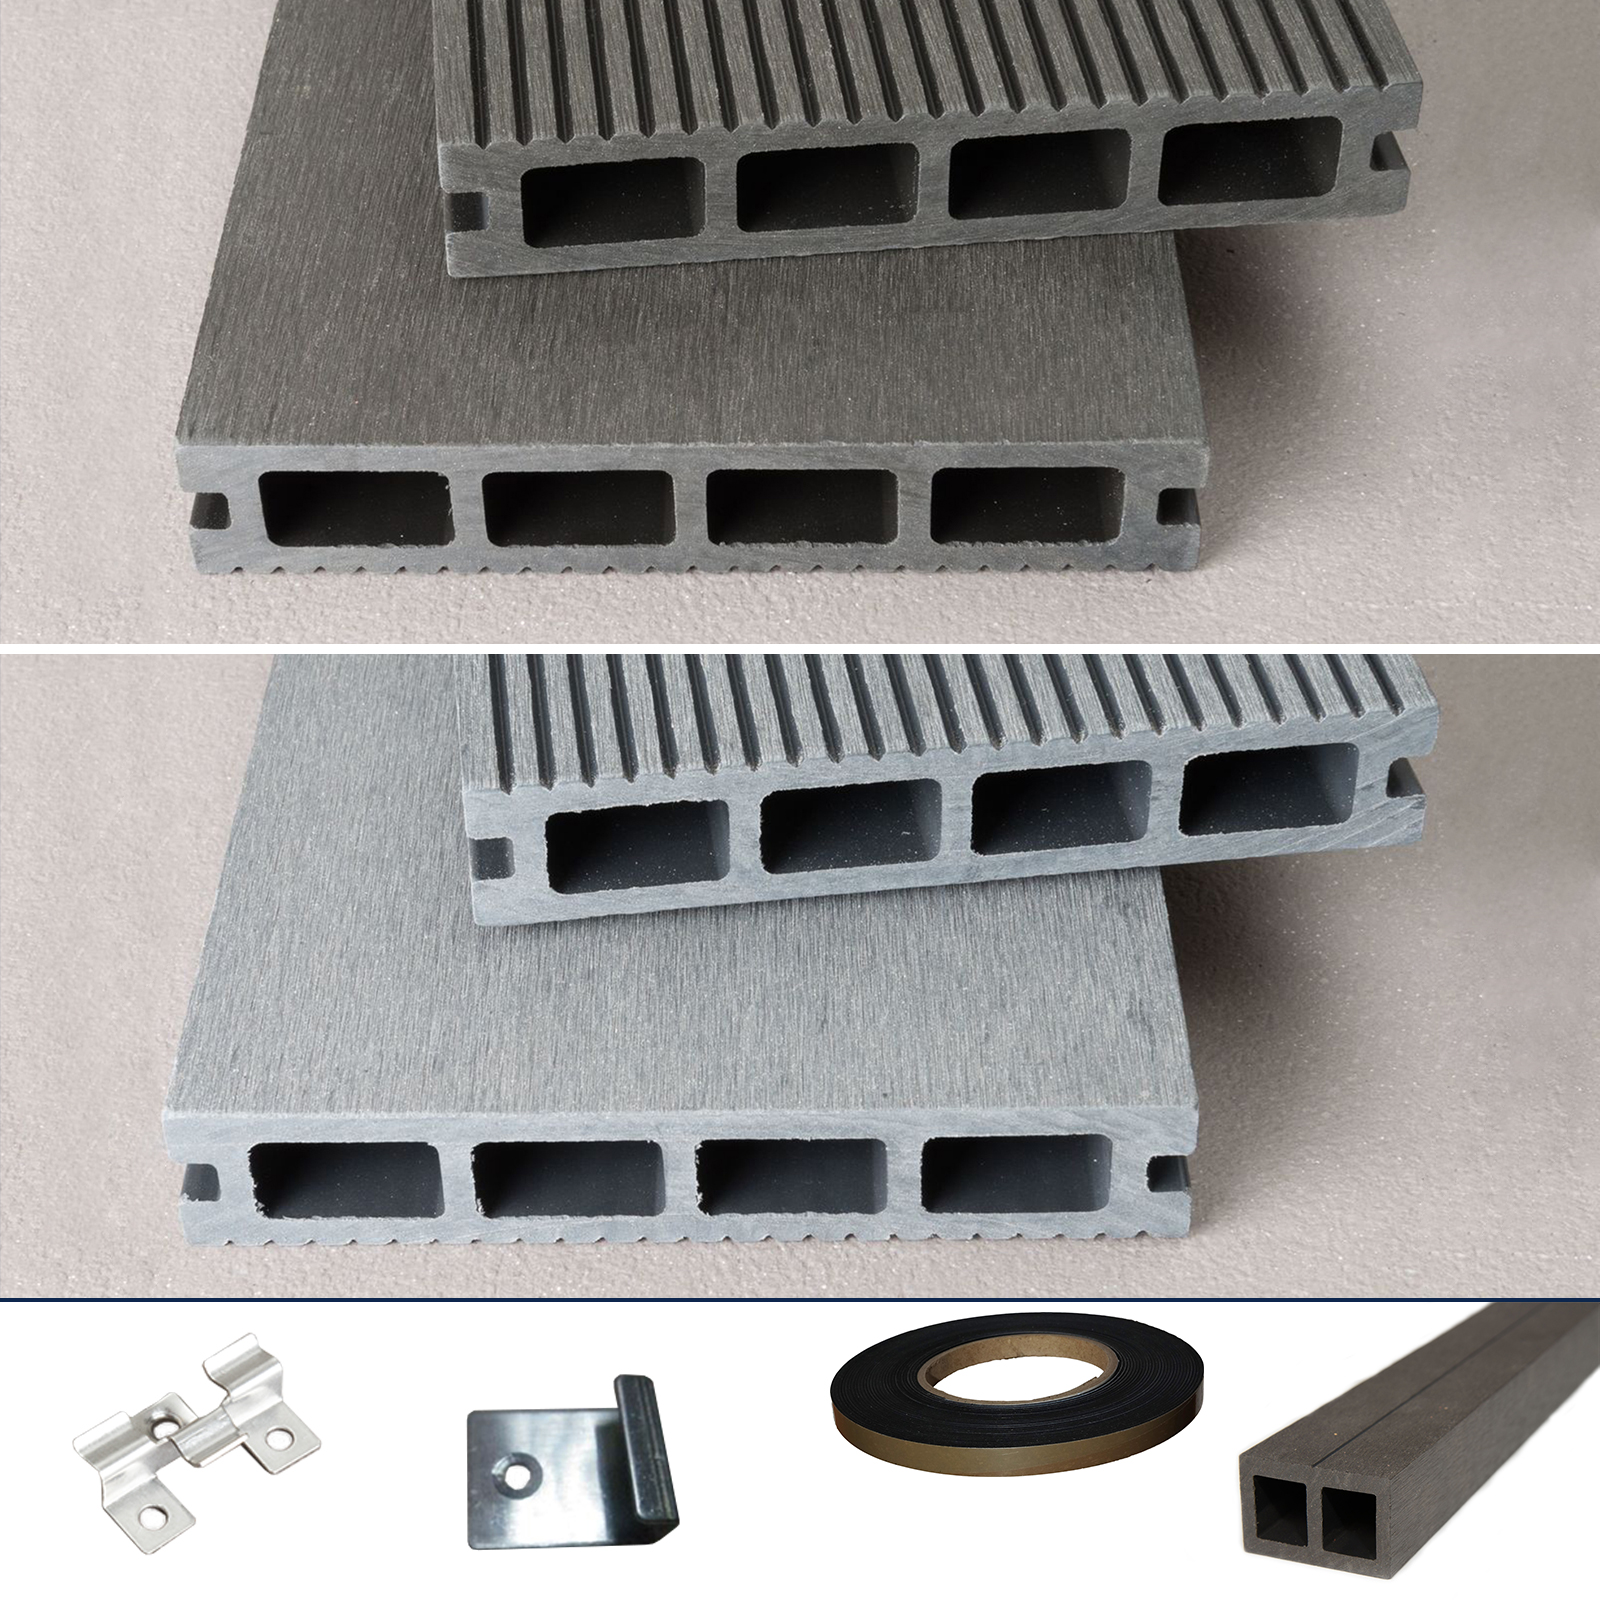 WPC-Terrassendielen-Terrassendiele-Komplettset-Komplettbausatz-Grau-Anthrazit